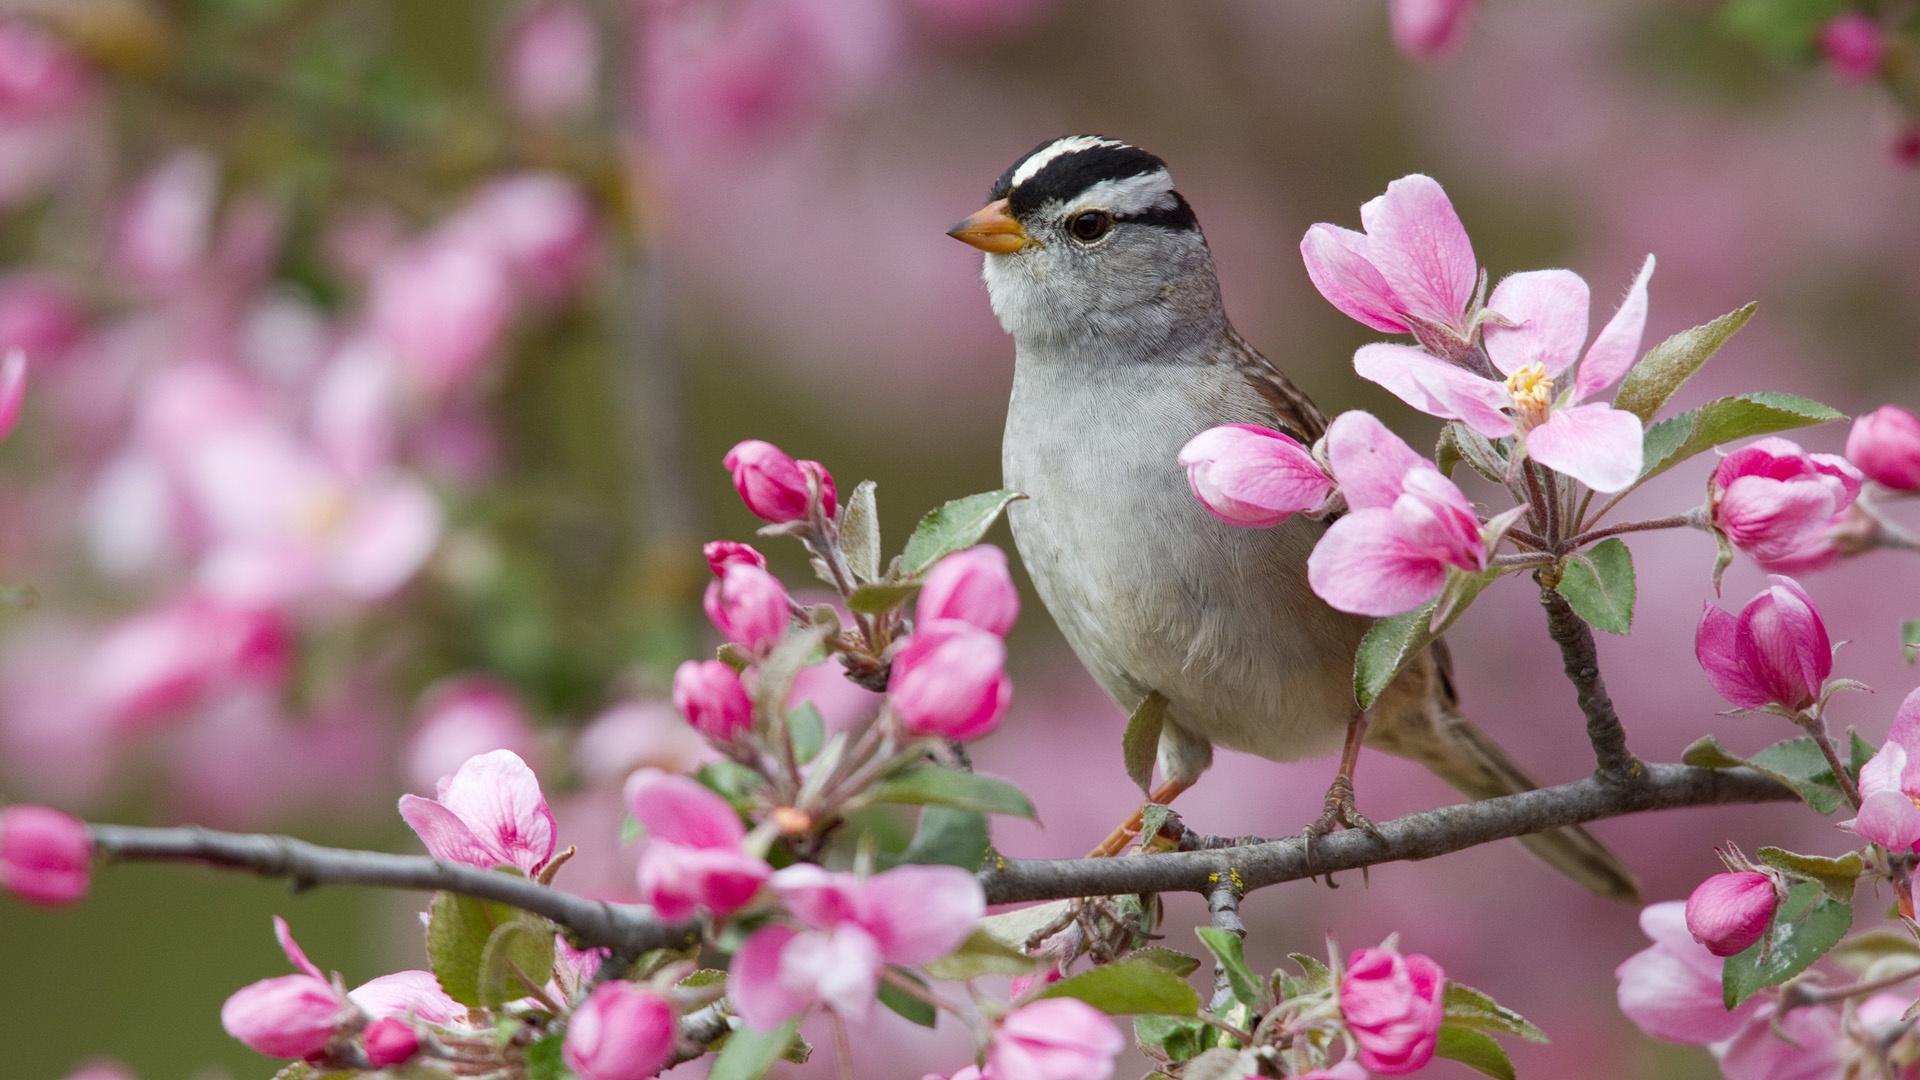 Графика весна природа животные бесплатно